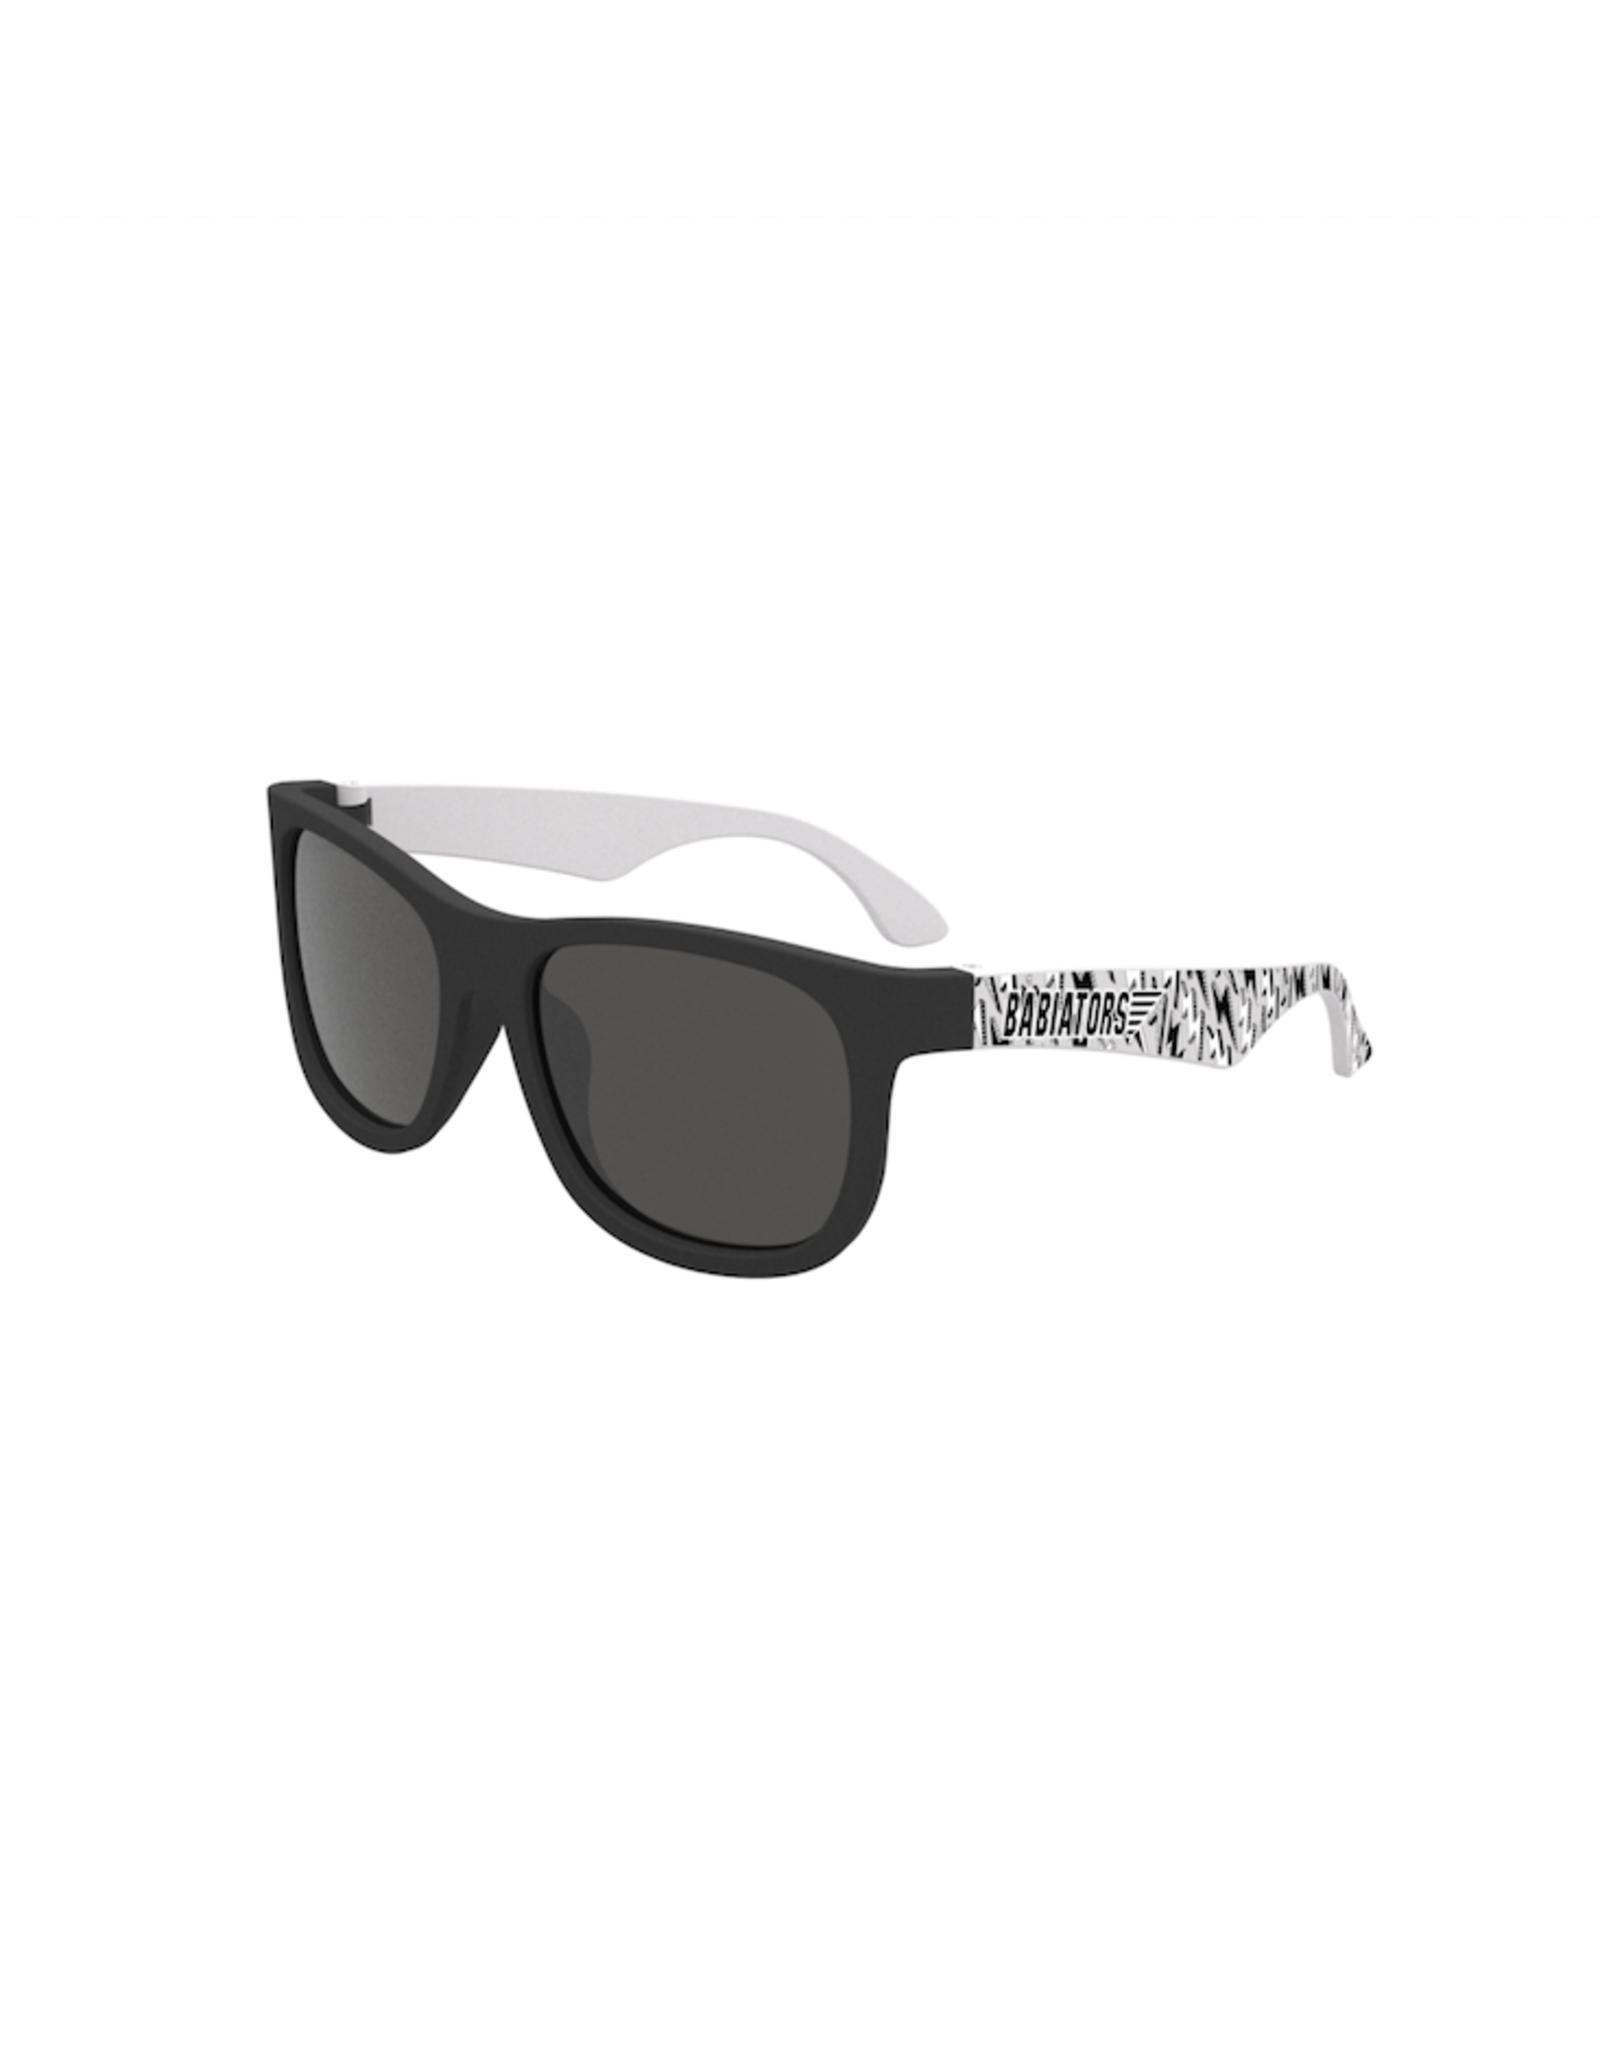 Babiators Limited Edition, Navigator, Sunglasses, It's Electric